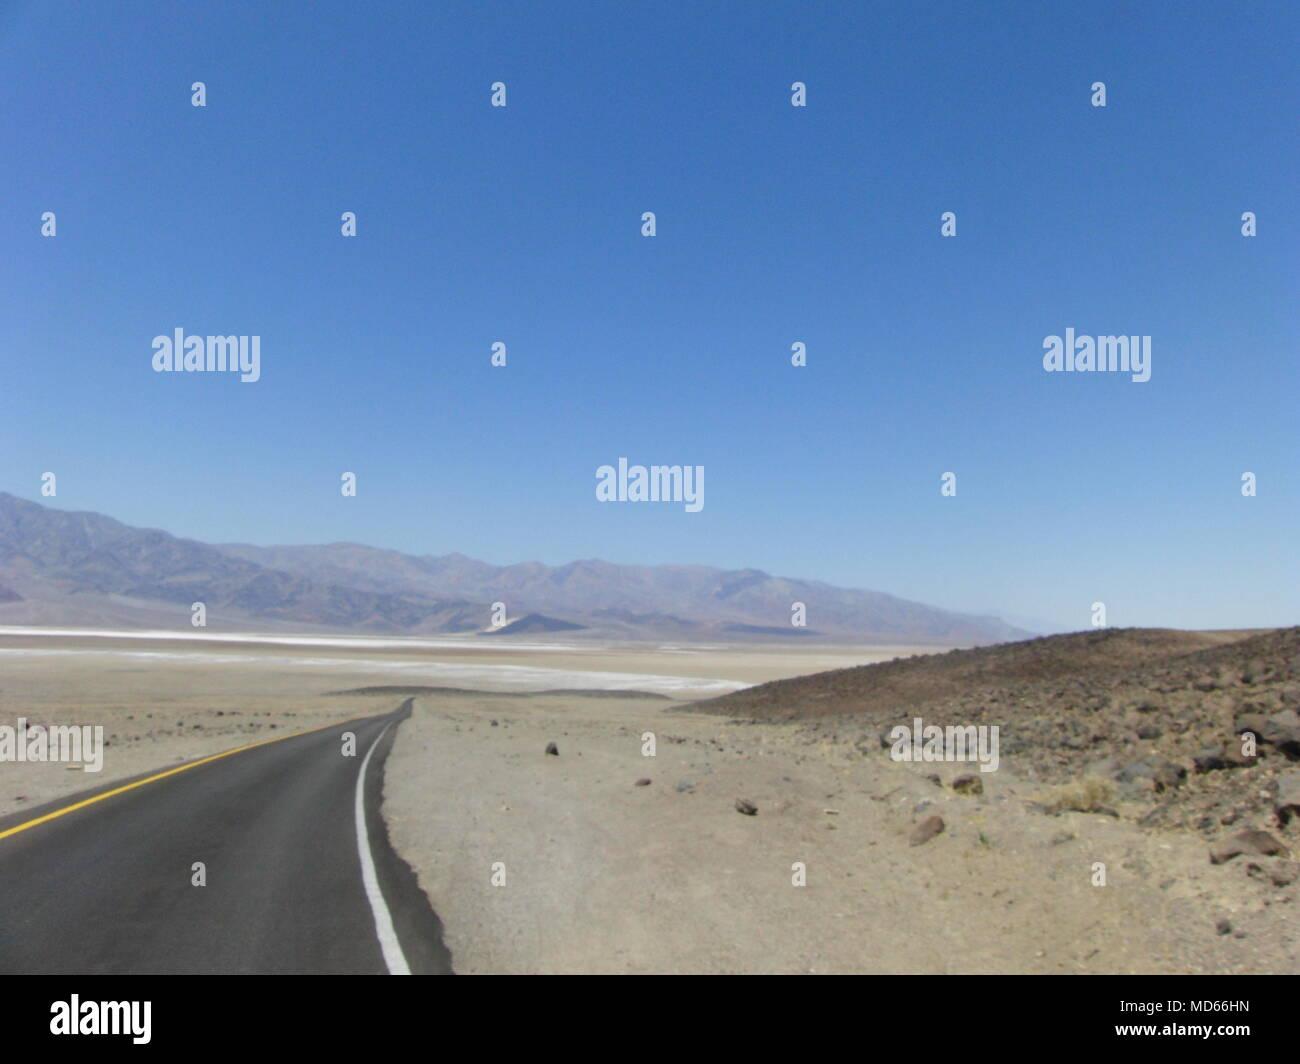 Desert road. Abrupt turn. Mountain landscape. Blue sky. - Stock Image